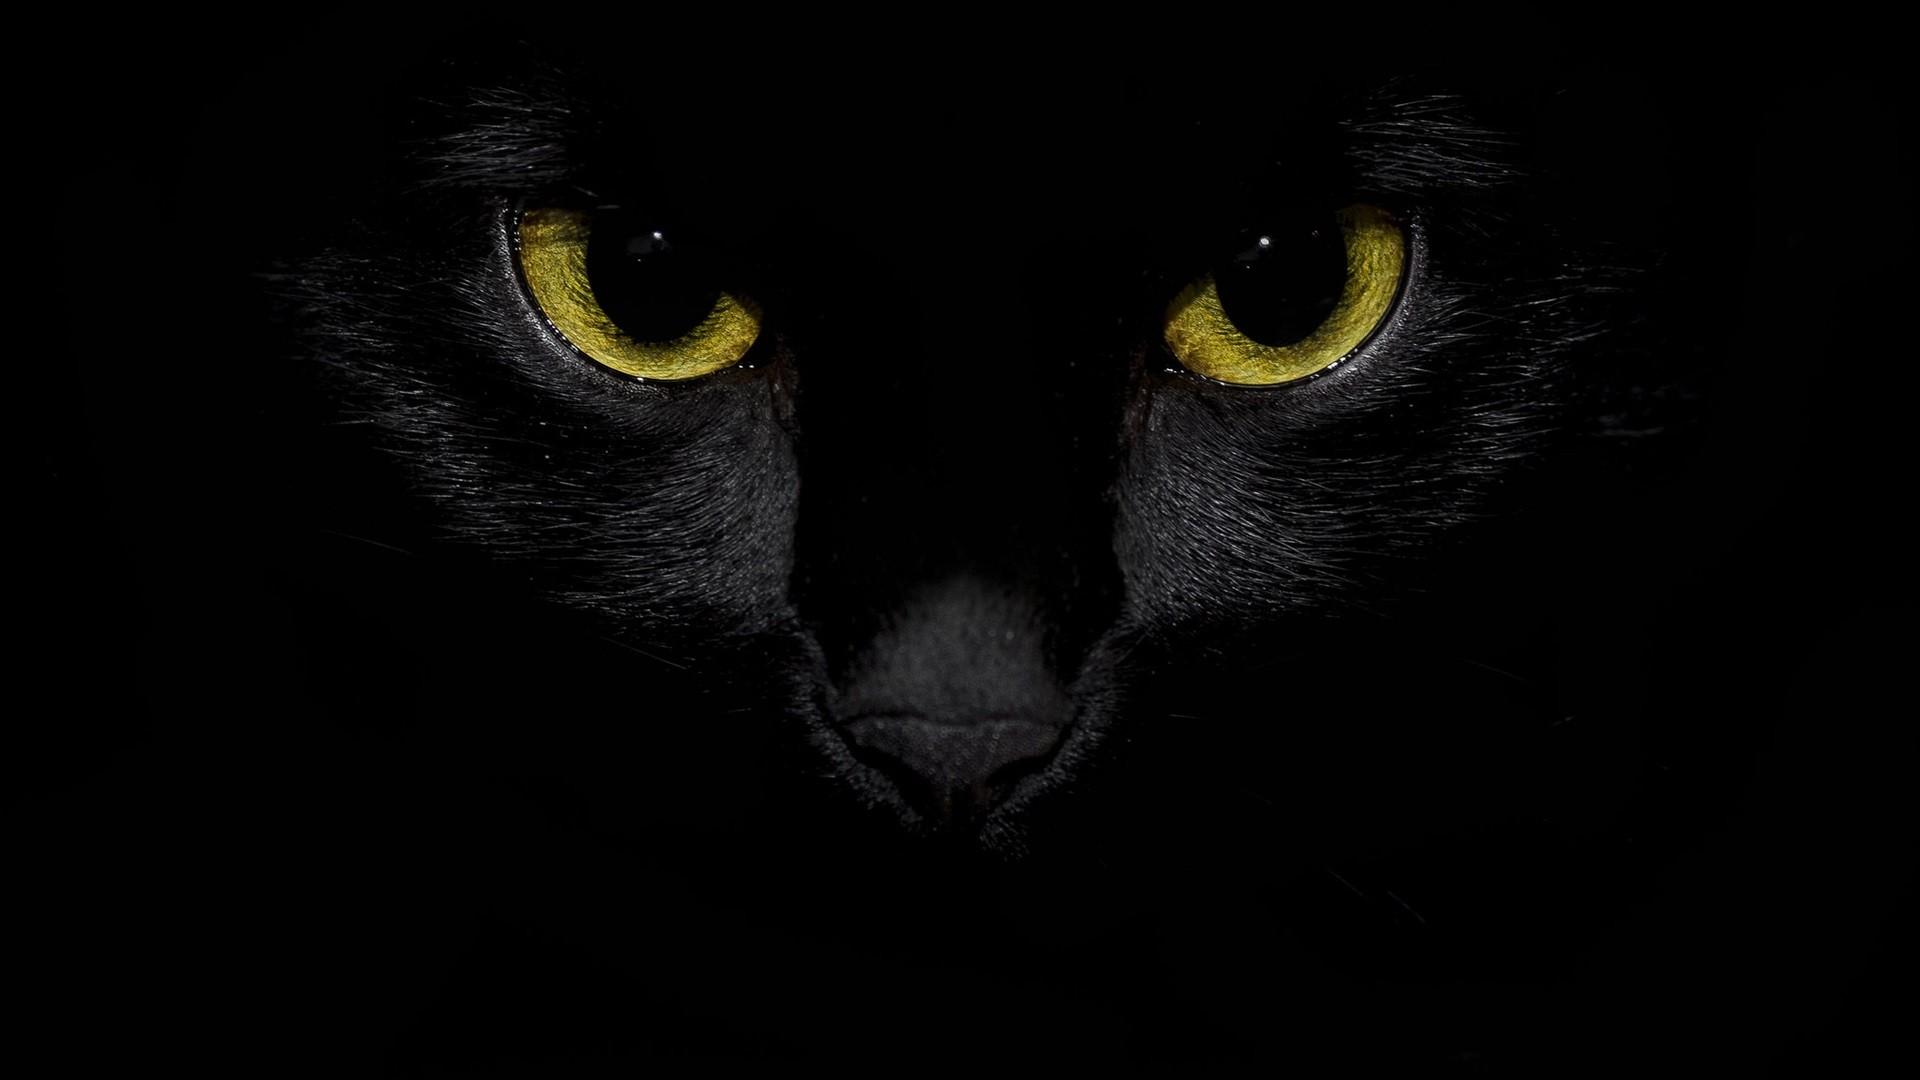 Black Cat free image